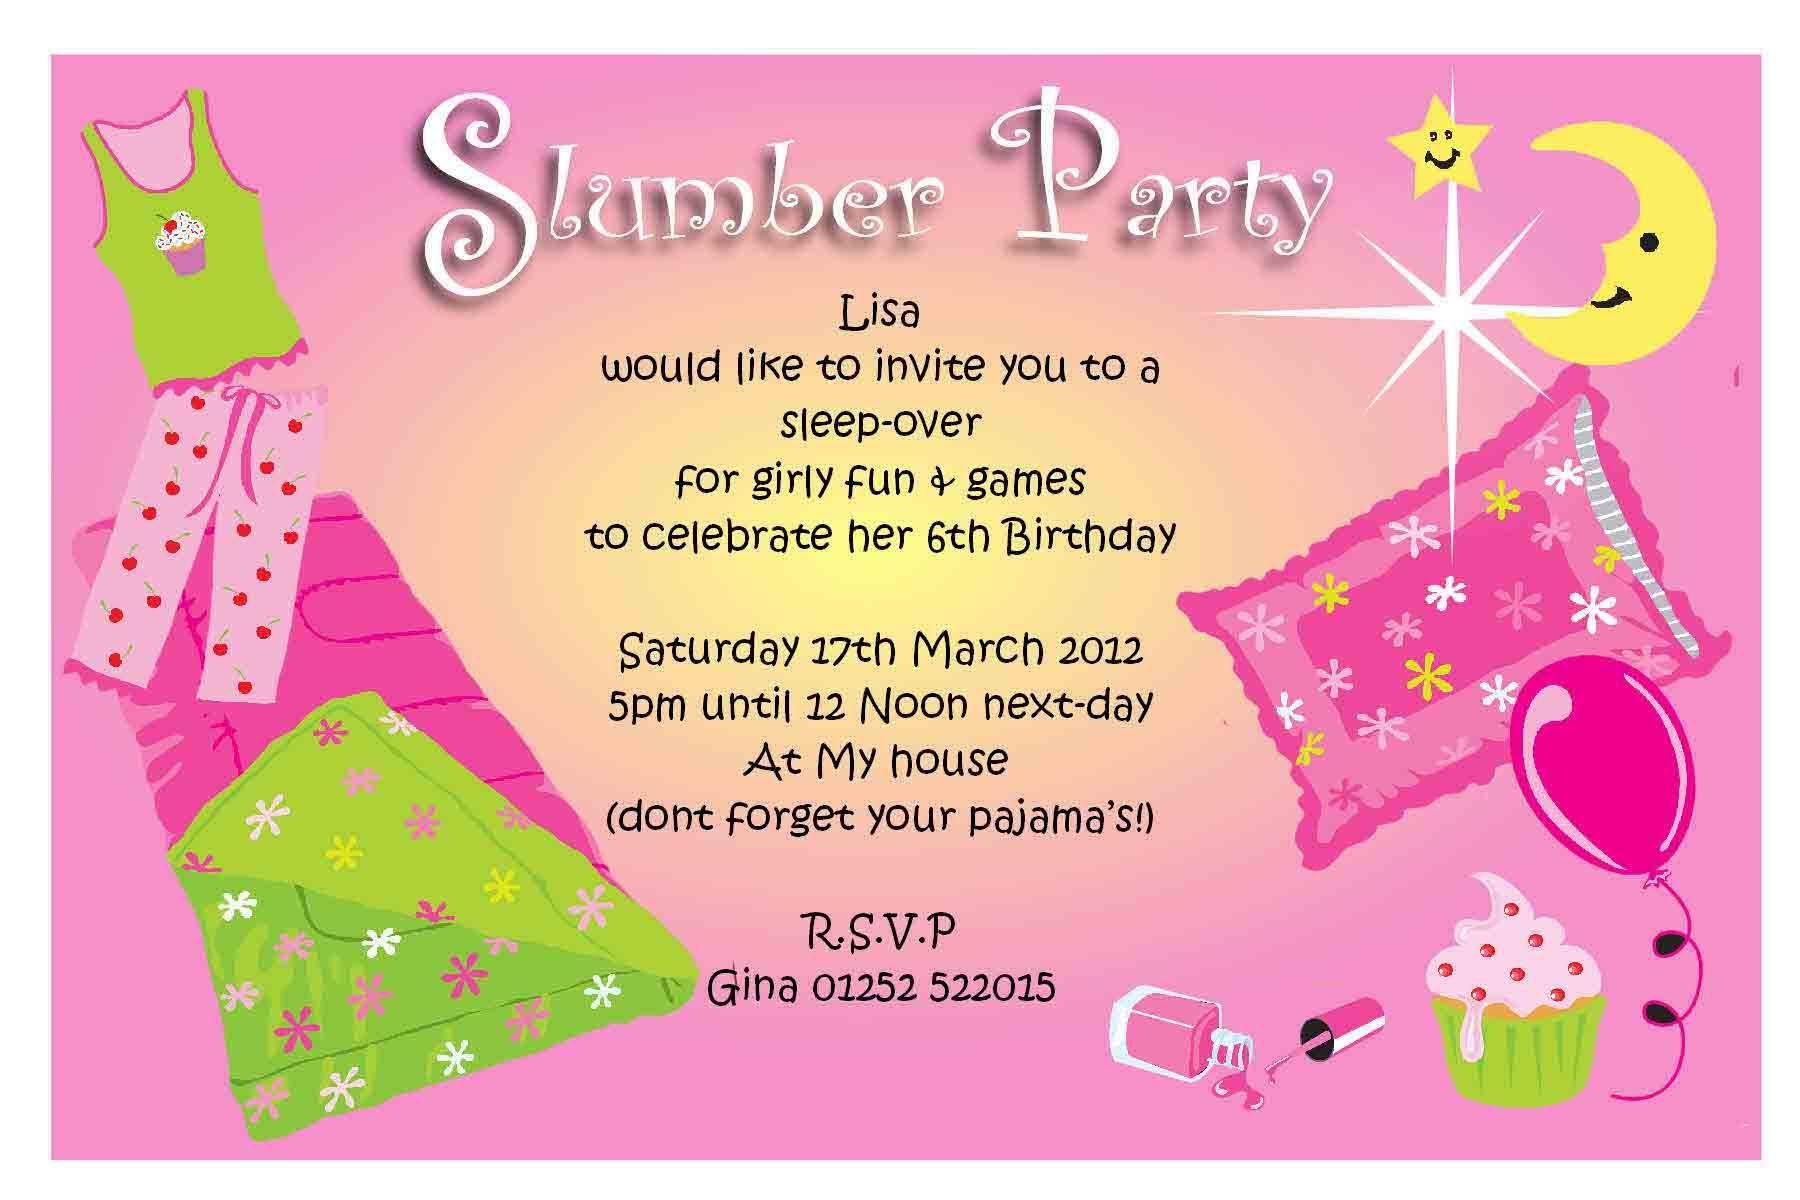 Free Pajama Party Invitations | Pajama Party | Pinterest | Party ...